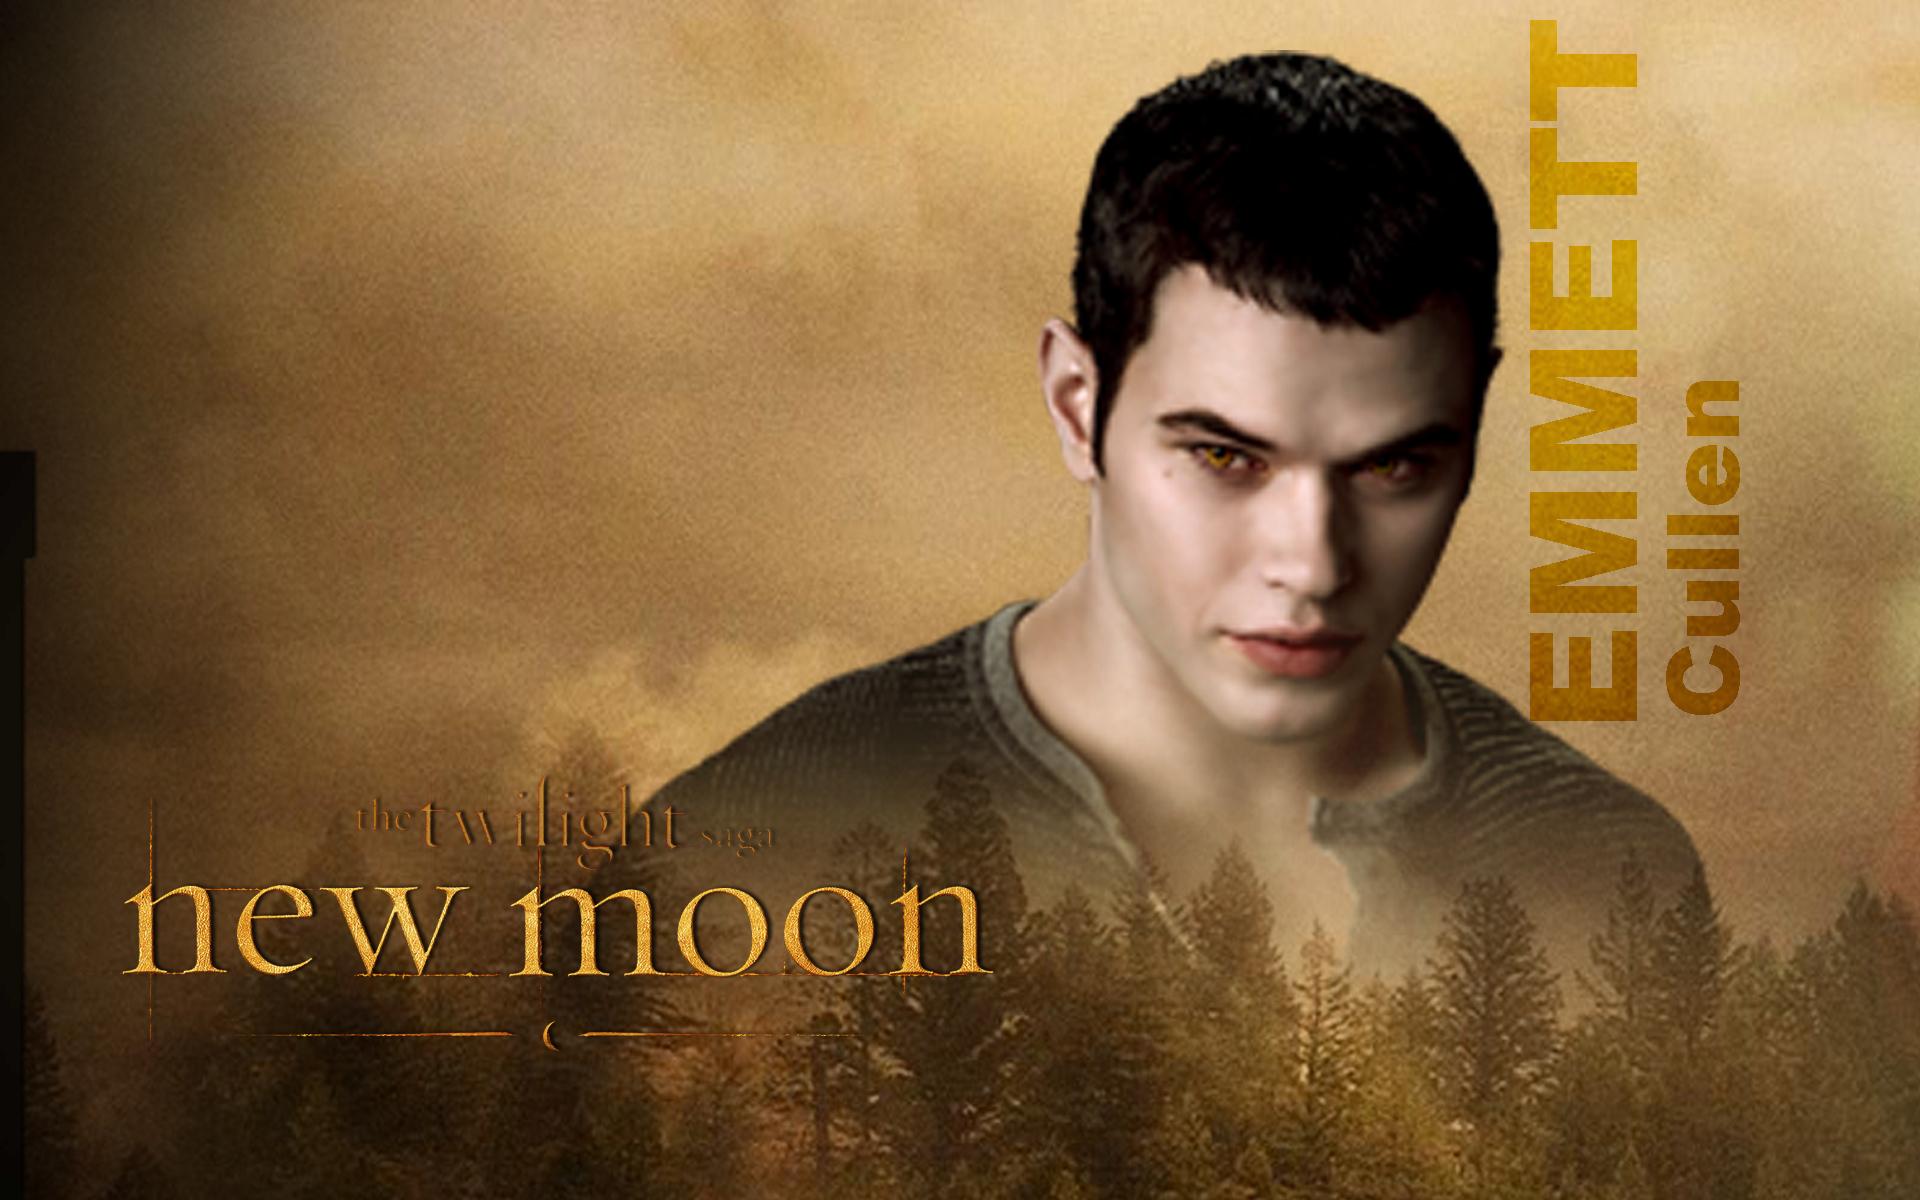 New Moon - New Moon Wallpaper (7286456) - Fanpop